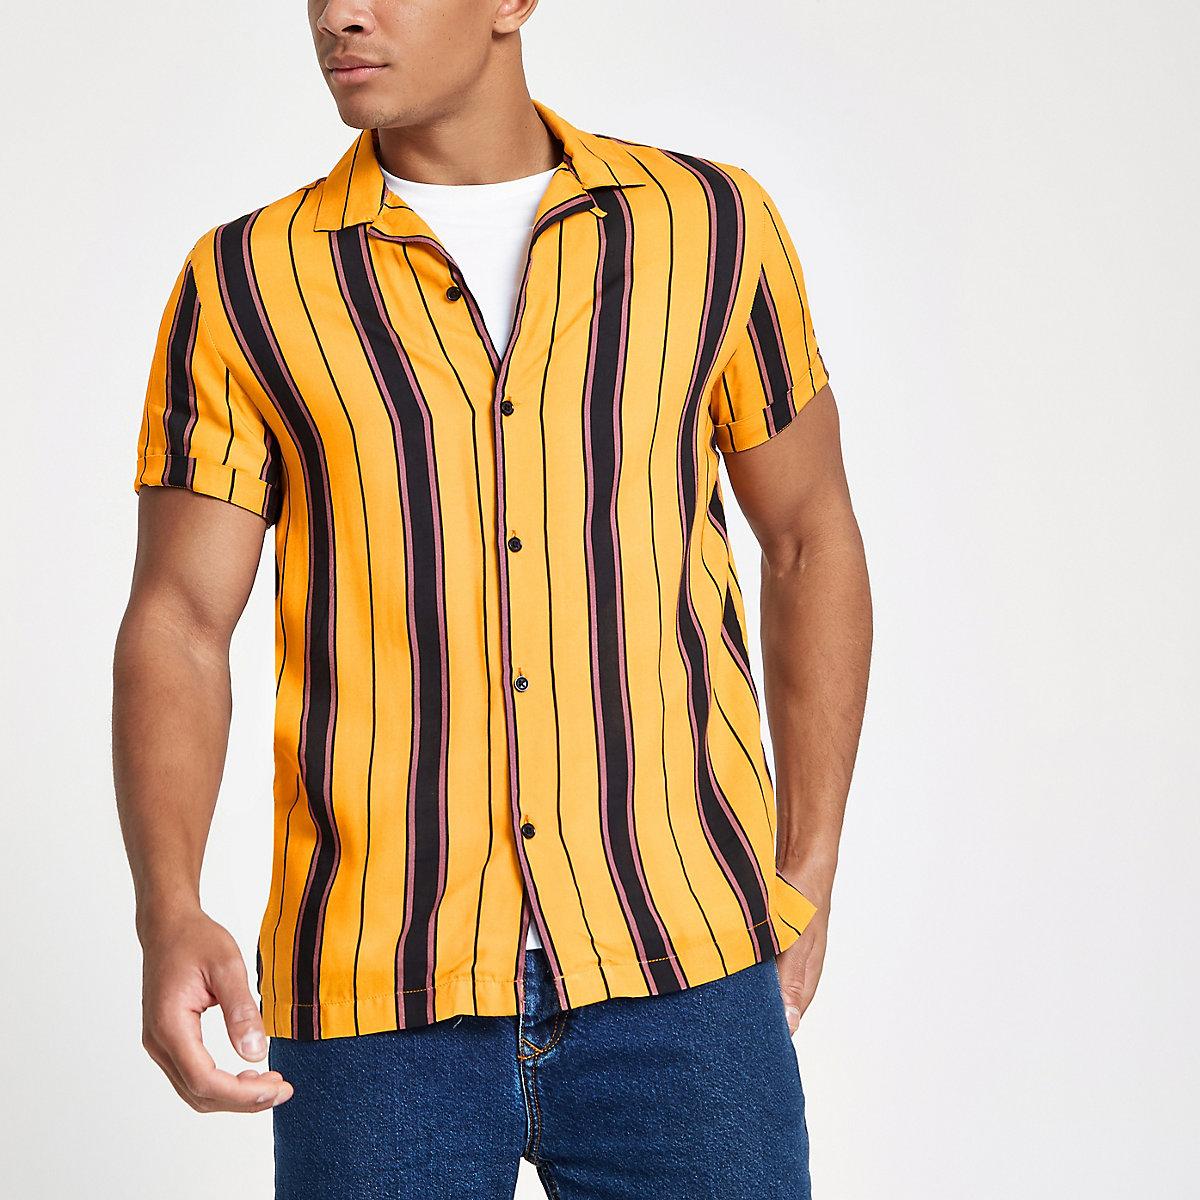 Yellow Stripe Short Sleeve Revere Shirt Short Sleeve Shirts